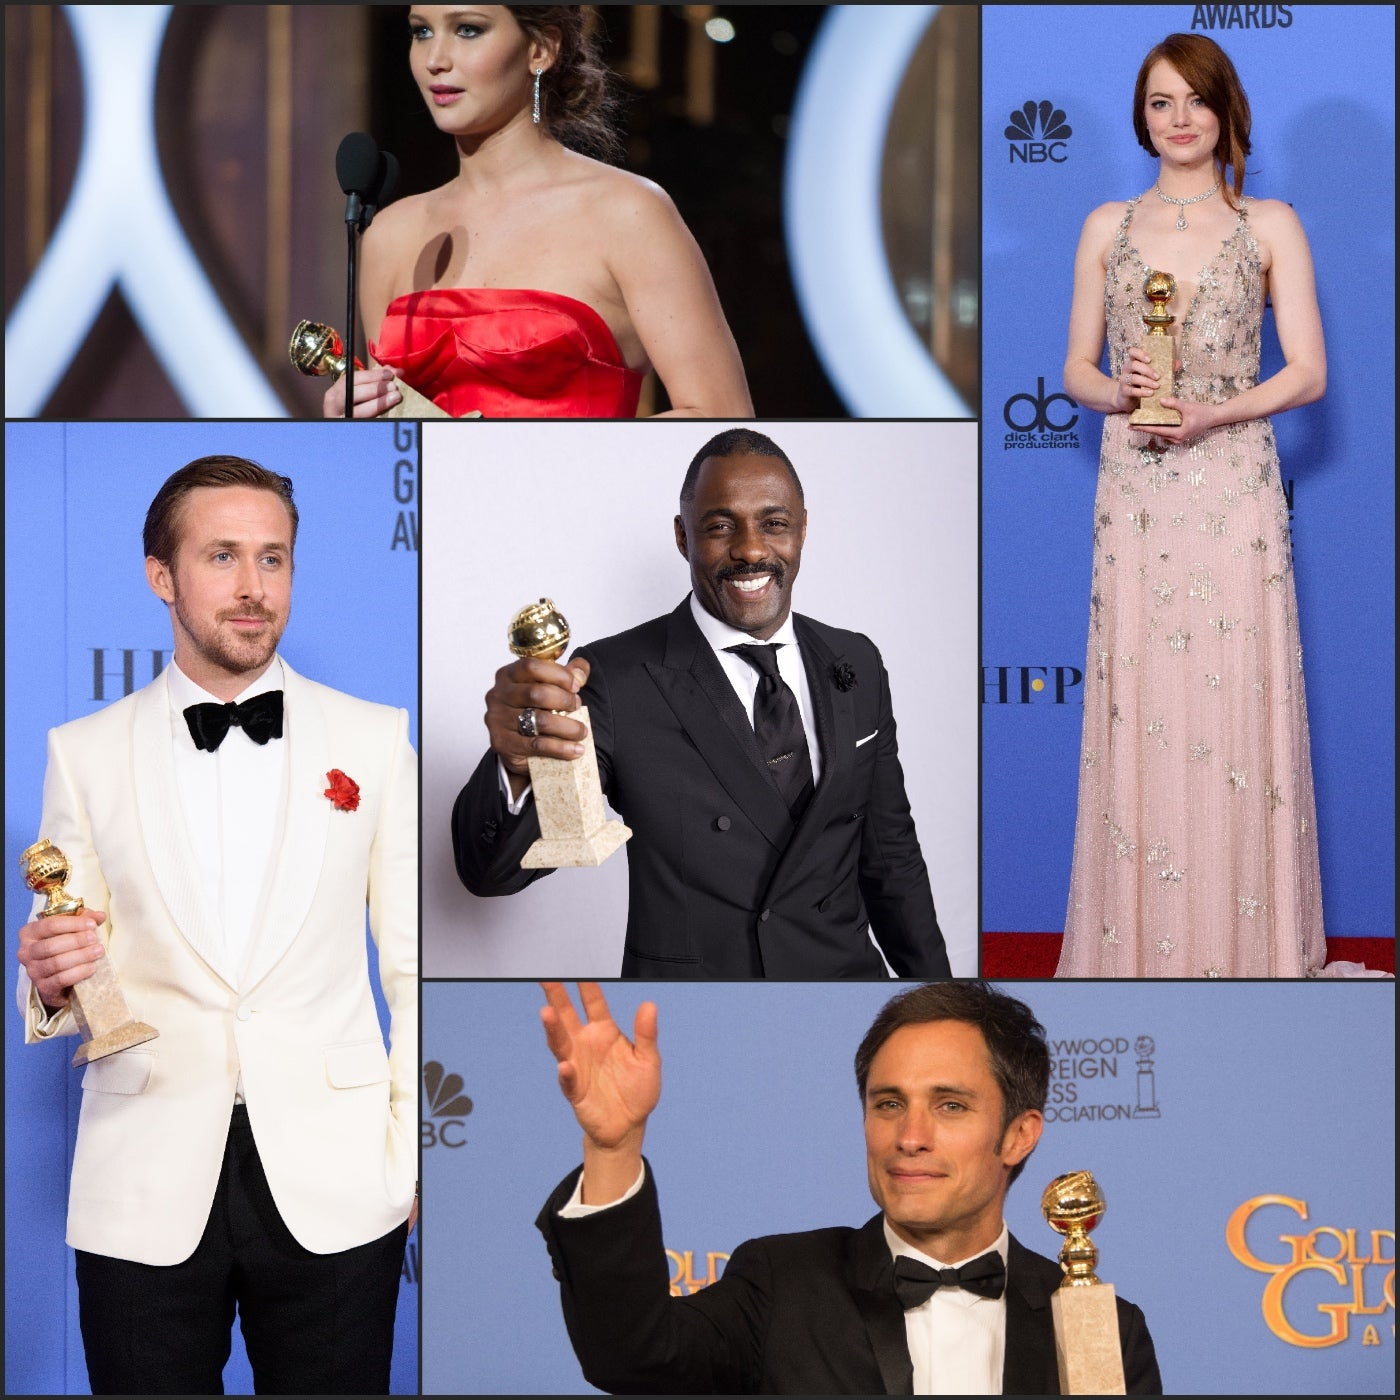 Golden Globe winers Gael Garcia Bernal, Emma Stone, Jennifer Lawrence, Idris Elba and Ryan Gosling